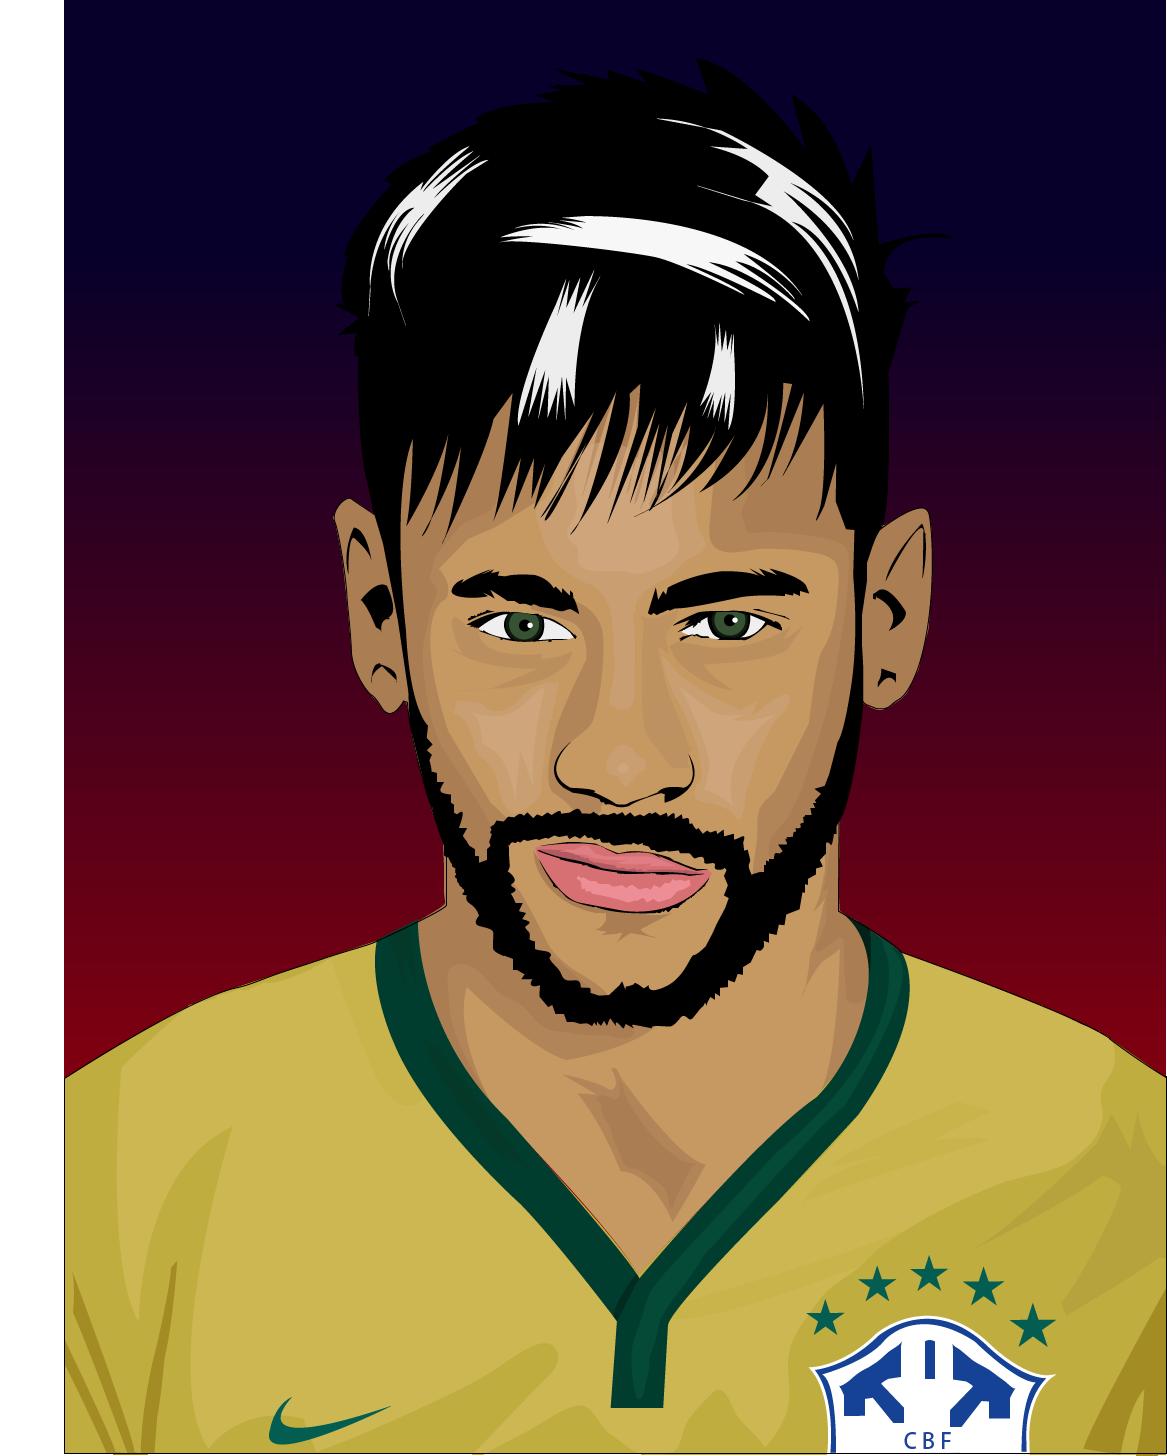 Neymar Jr Drawn In Cartoon Style Footballers Neymar Jr Neymar